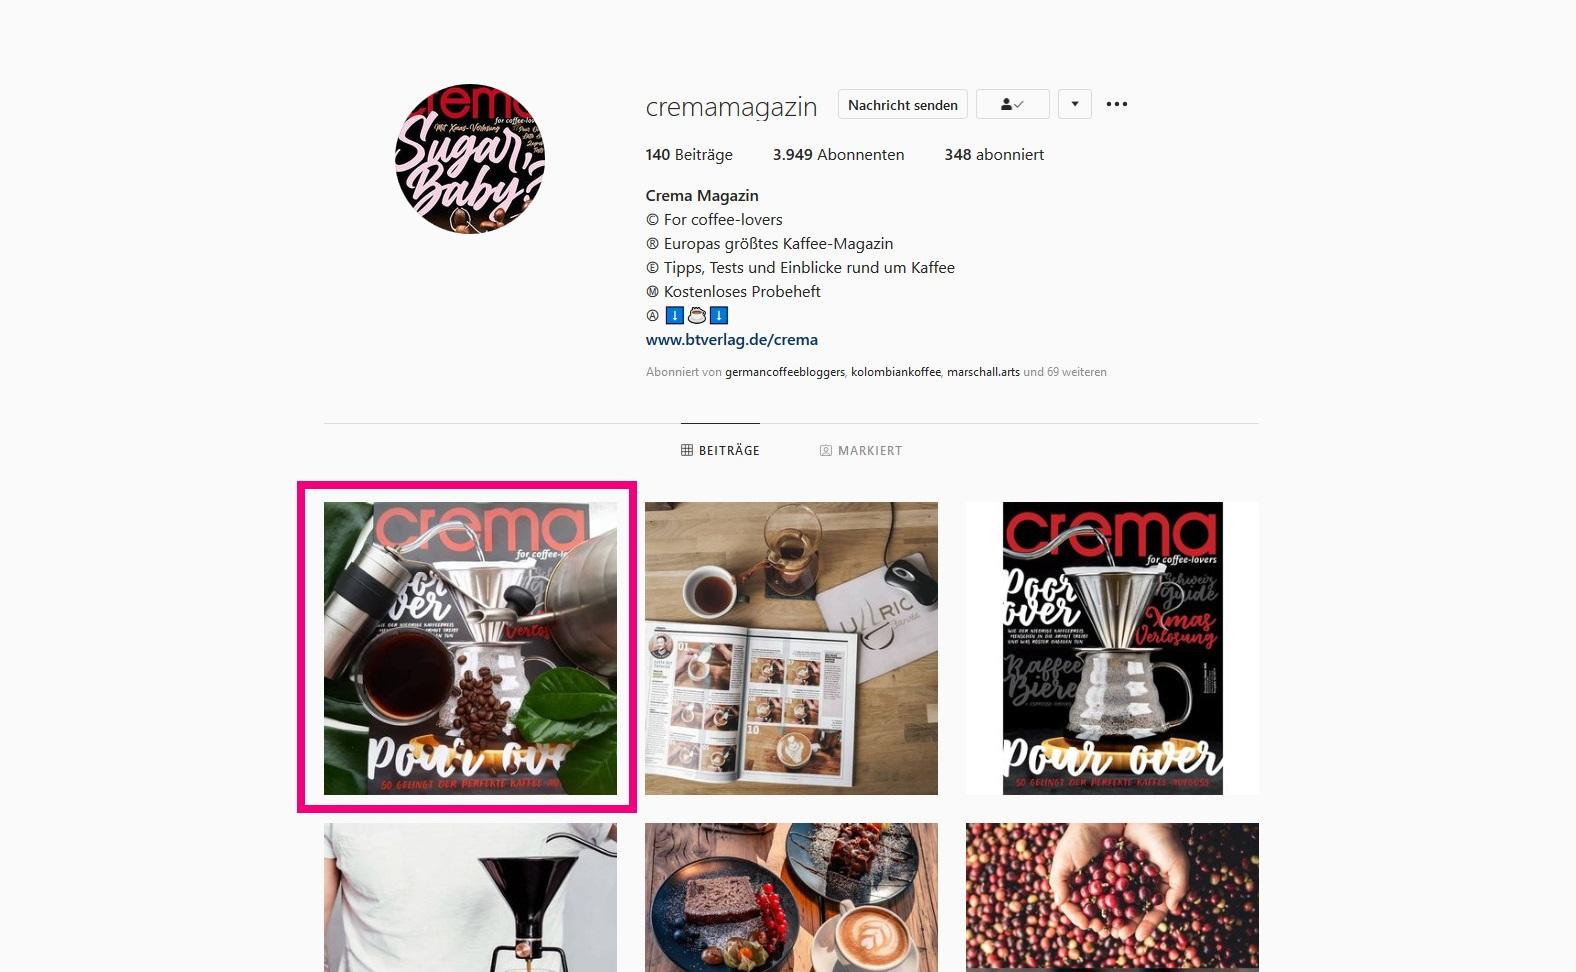 Bunaa - Crema Magazin Instagram